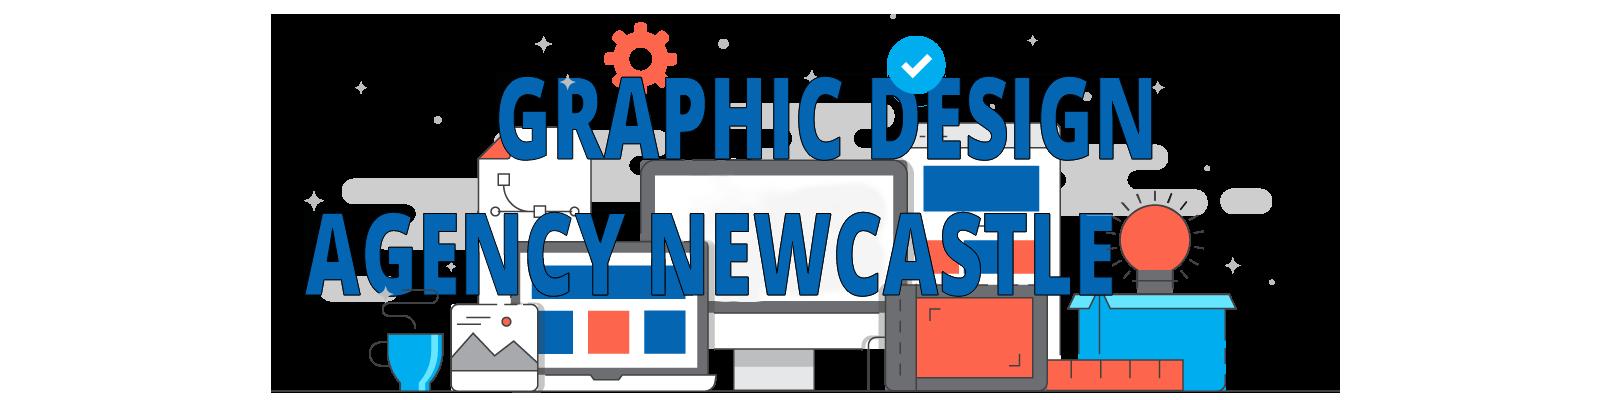 seek social graphic design agency newcastle